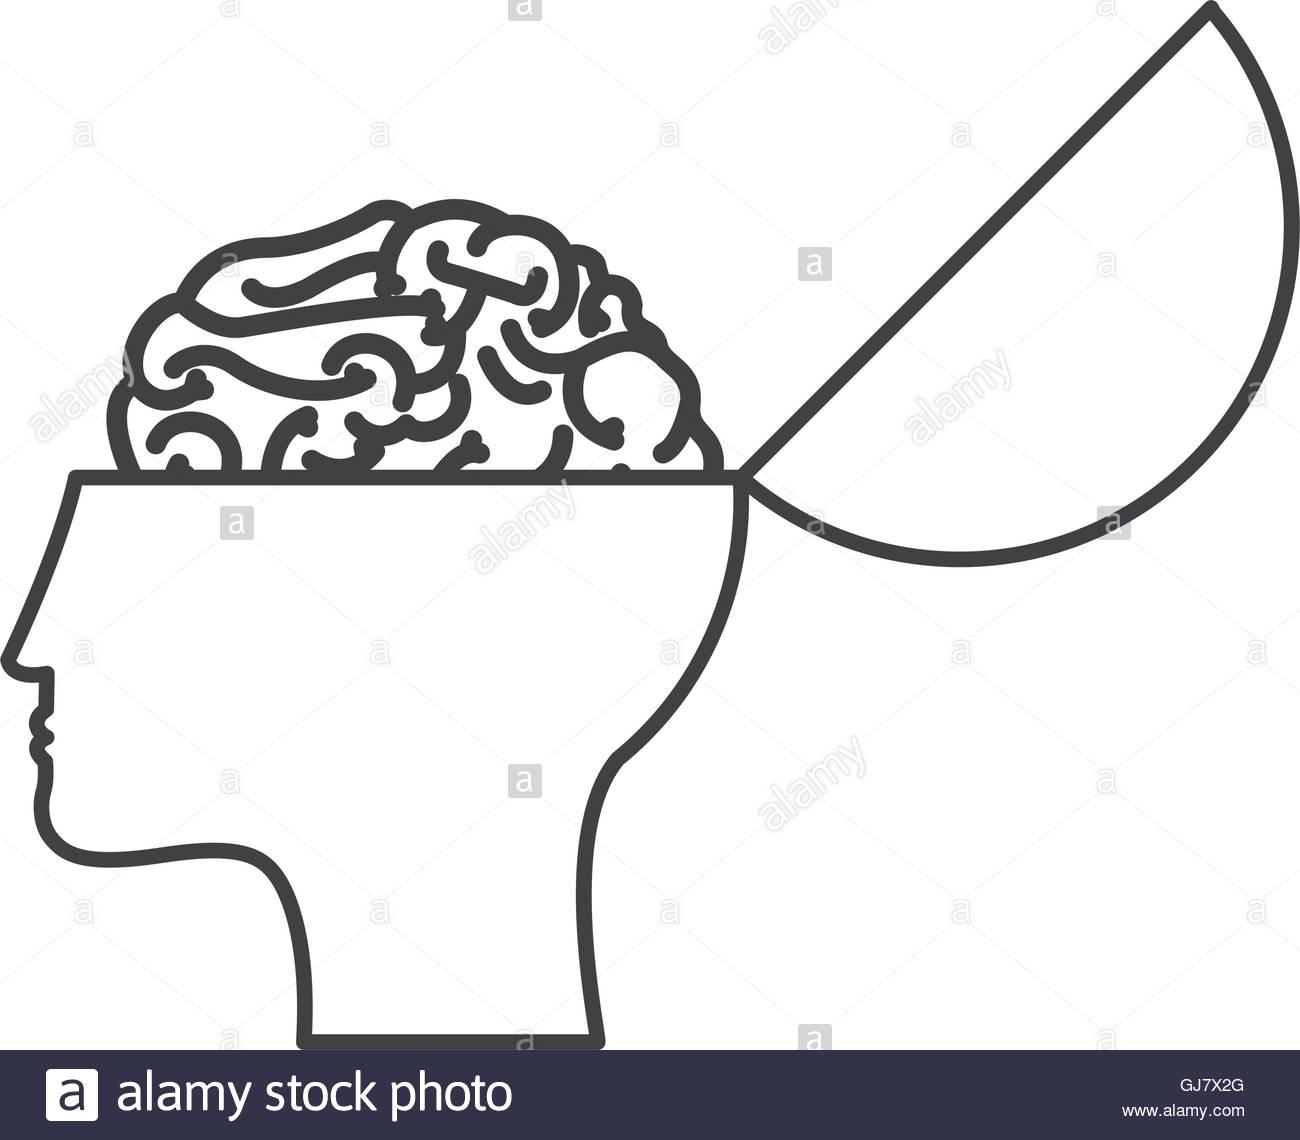 1300x1140 Open Human Head And Brain Icon Stock Vector Art Amp Illustration